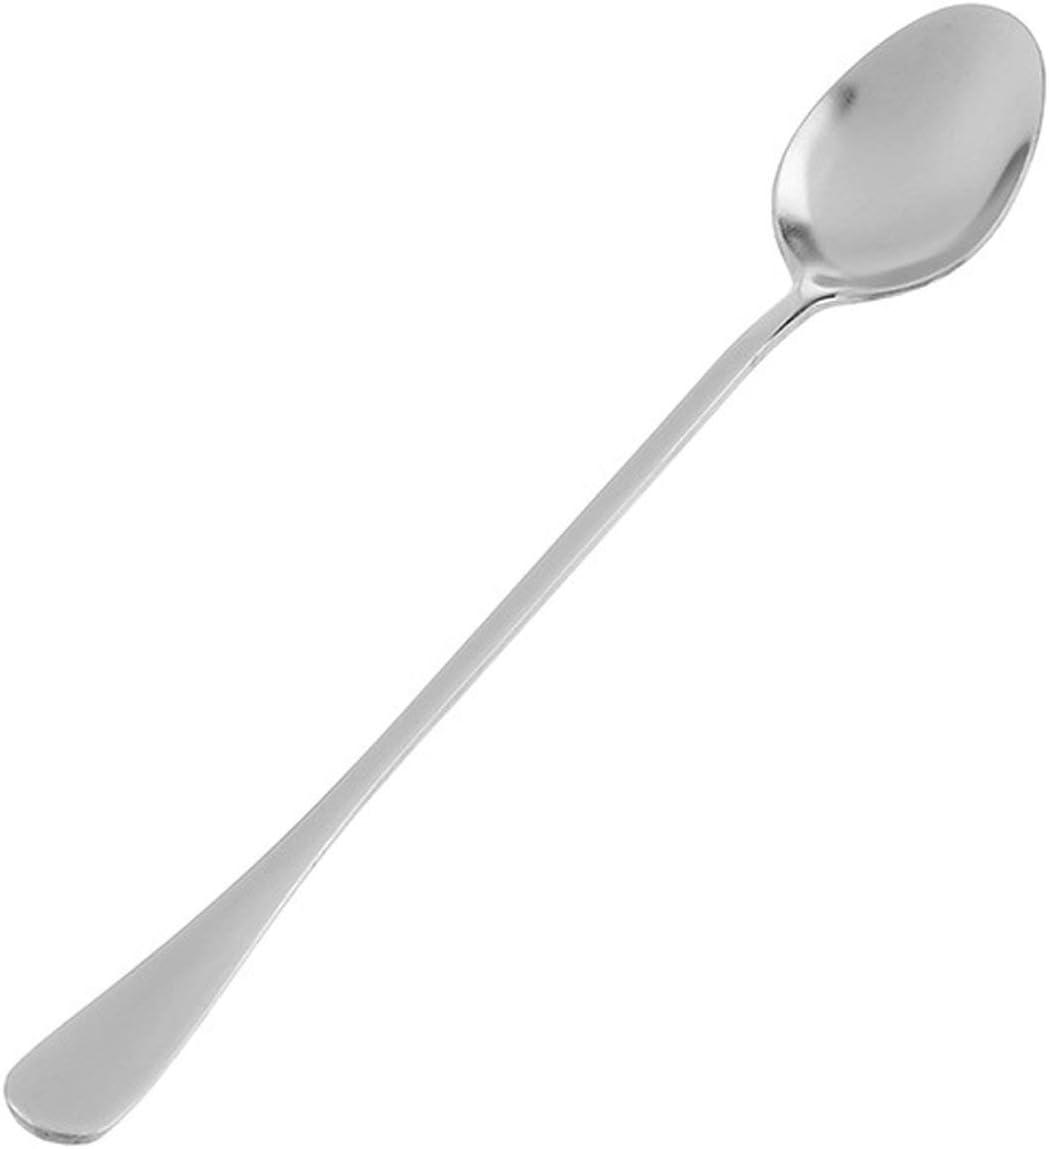 T4529 Cucina Creativa in Acciaio Inox Cucchiaio a Manico Lungo Cucchiaio di Ghiaccio Ufficio cucchiaino da caff/è mescolando Cucchiaio Cucchiaio Lungo #Pennytupu